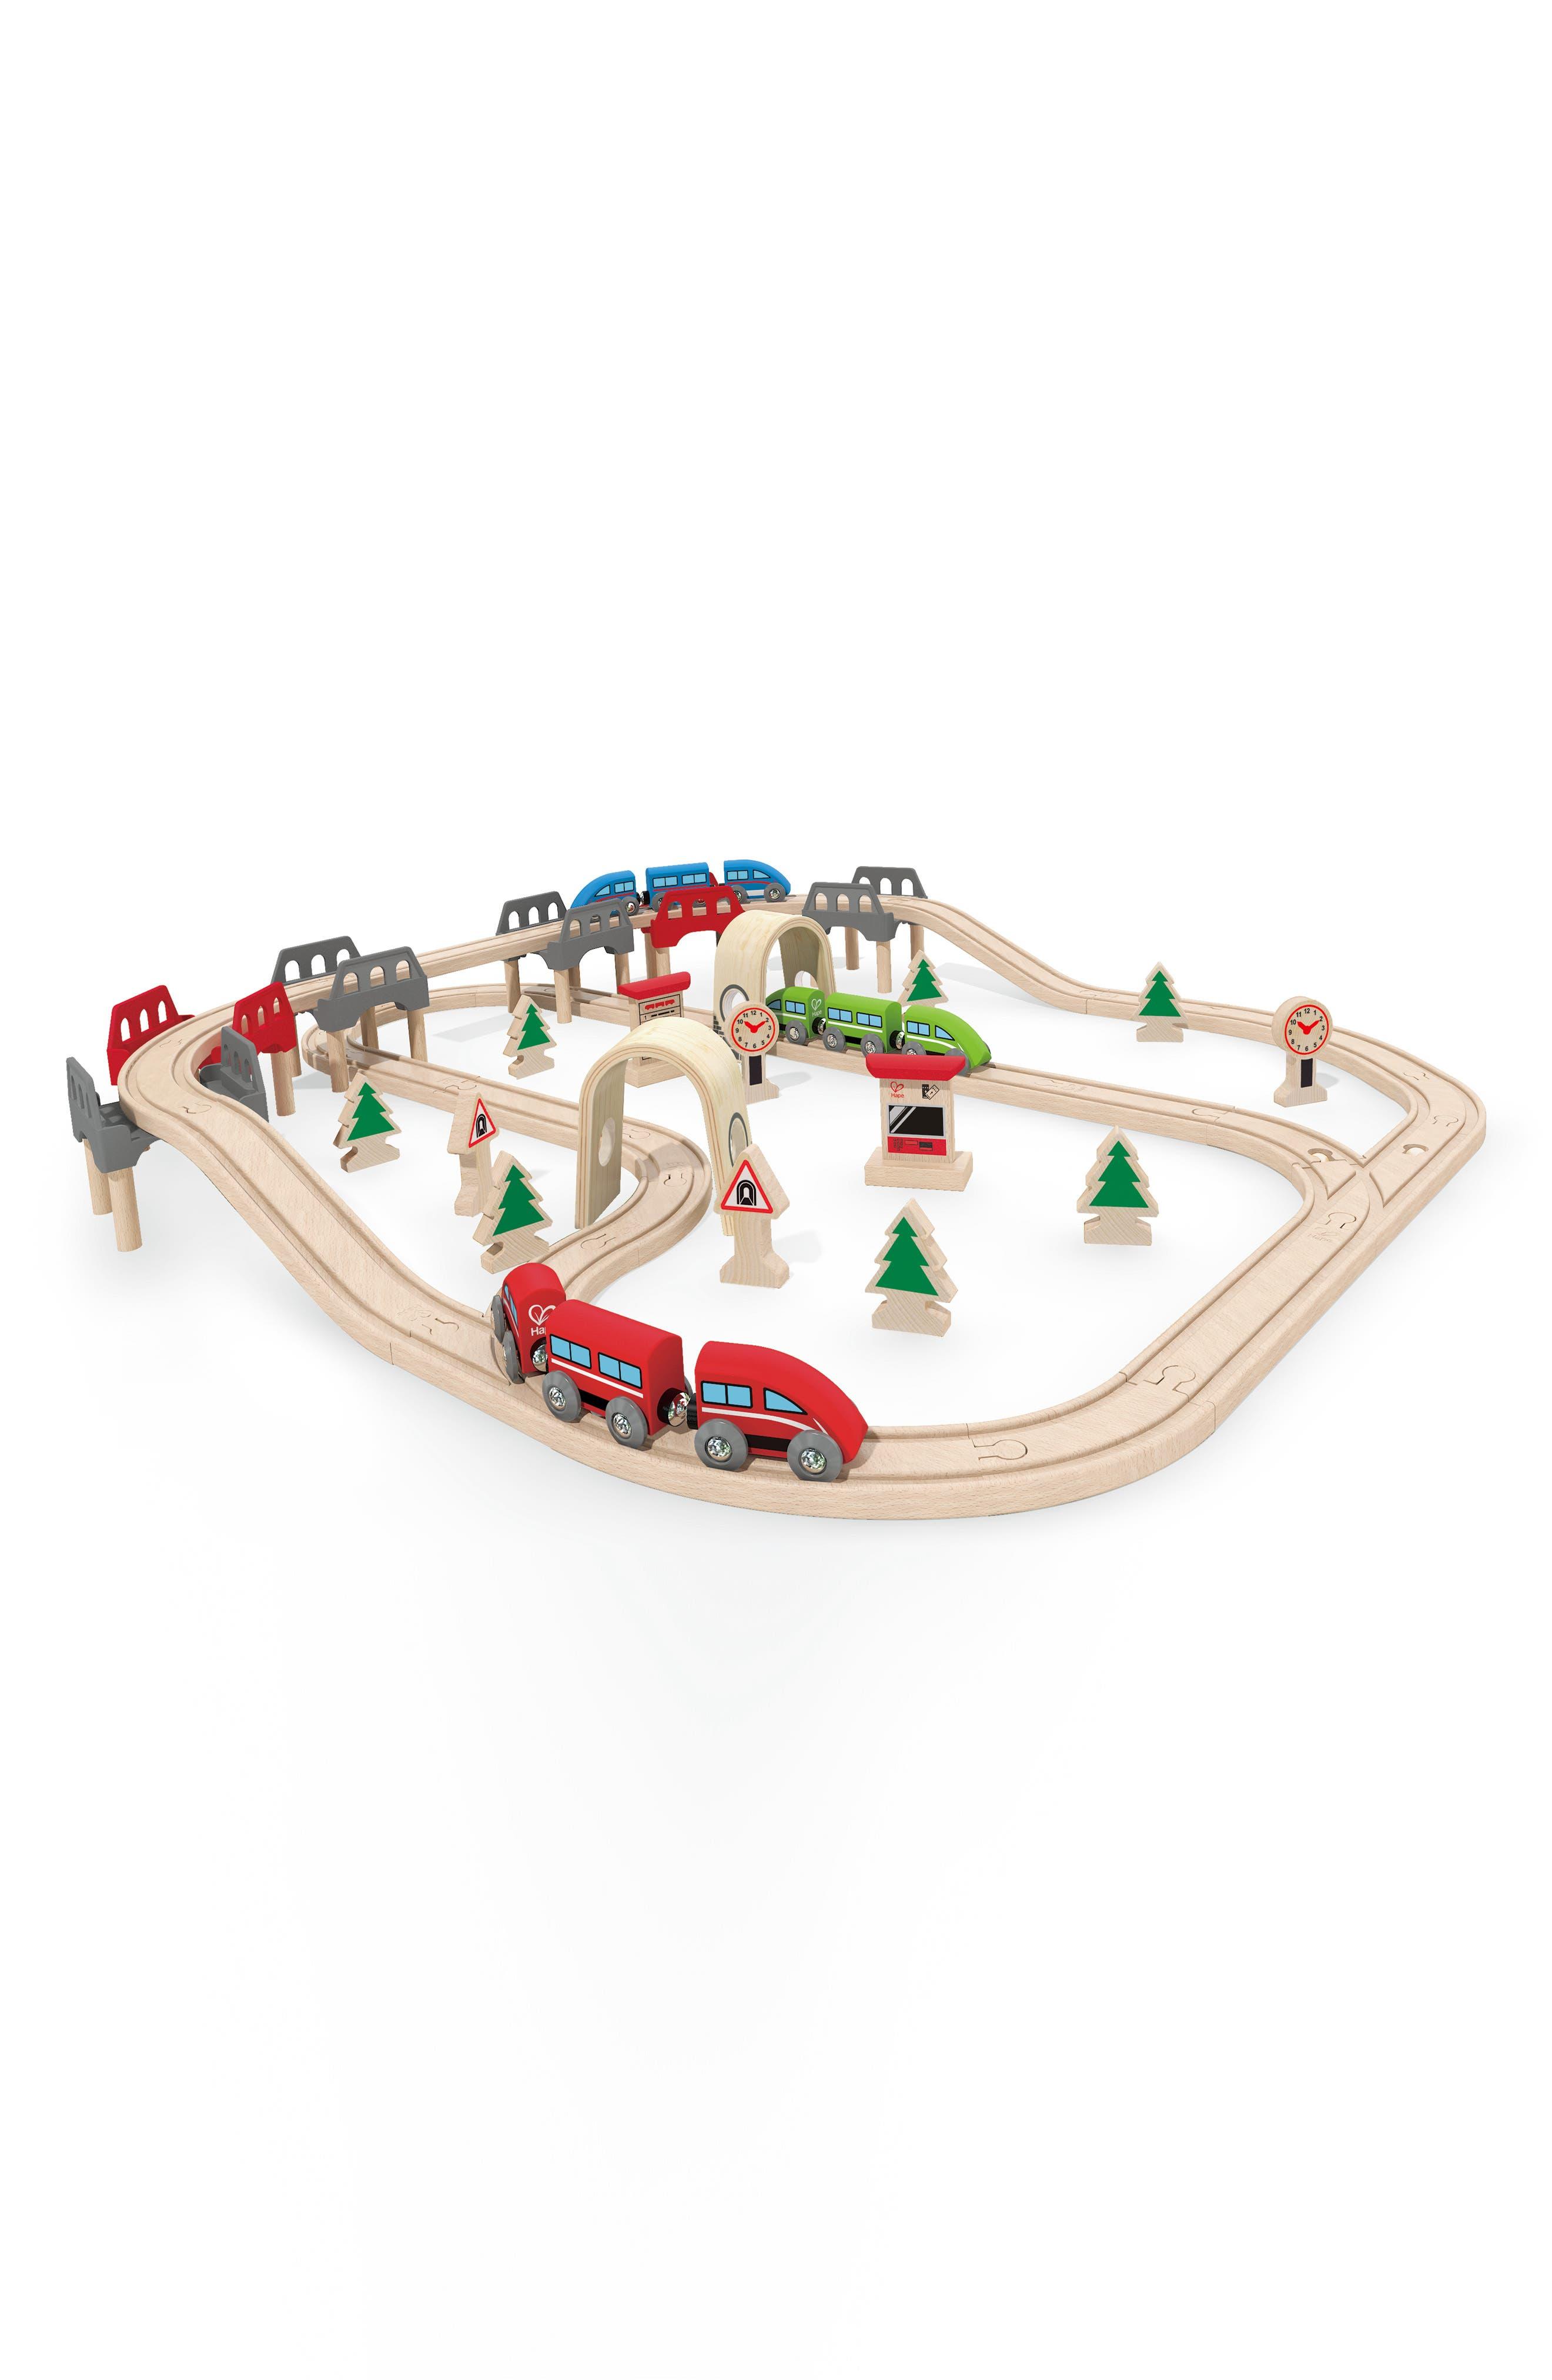 High & Low Railway Set,                             Main thumbnail 1, color,                             250